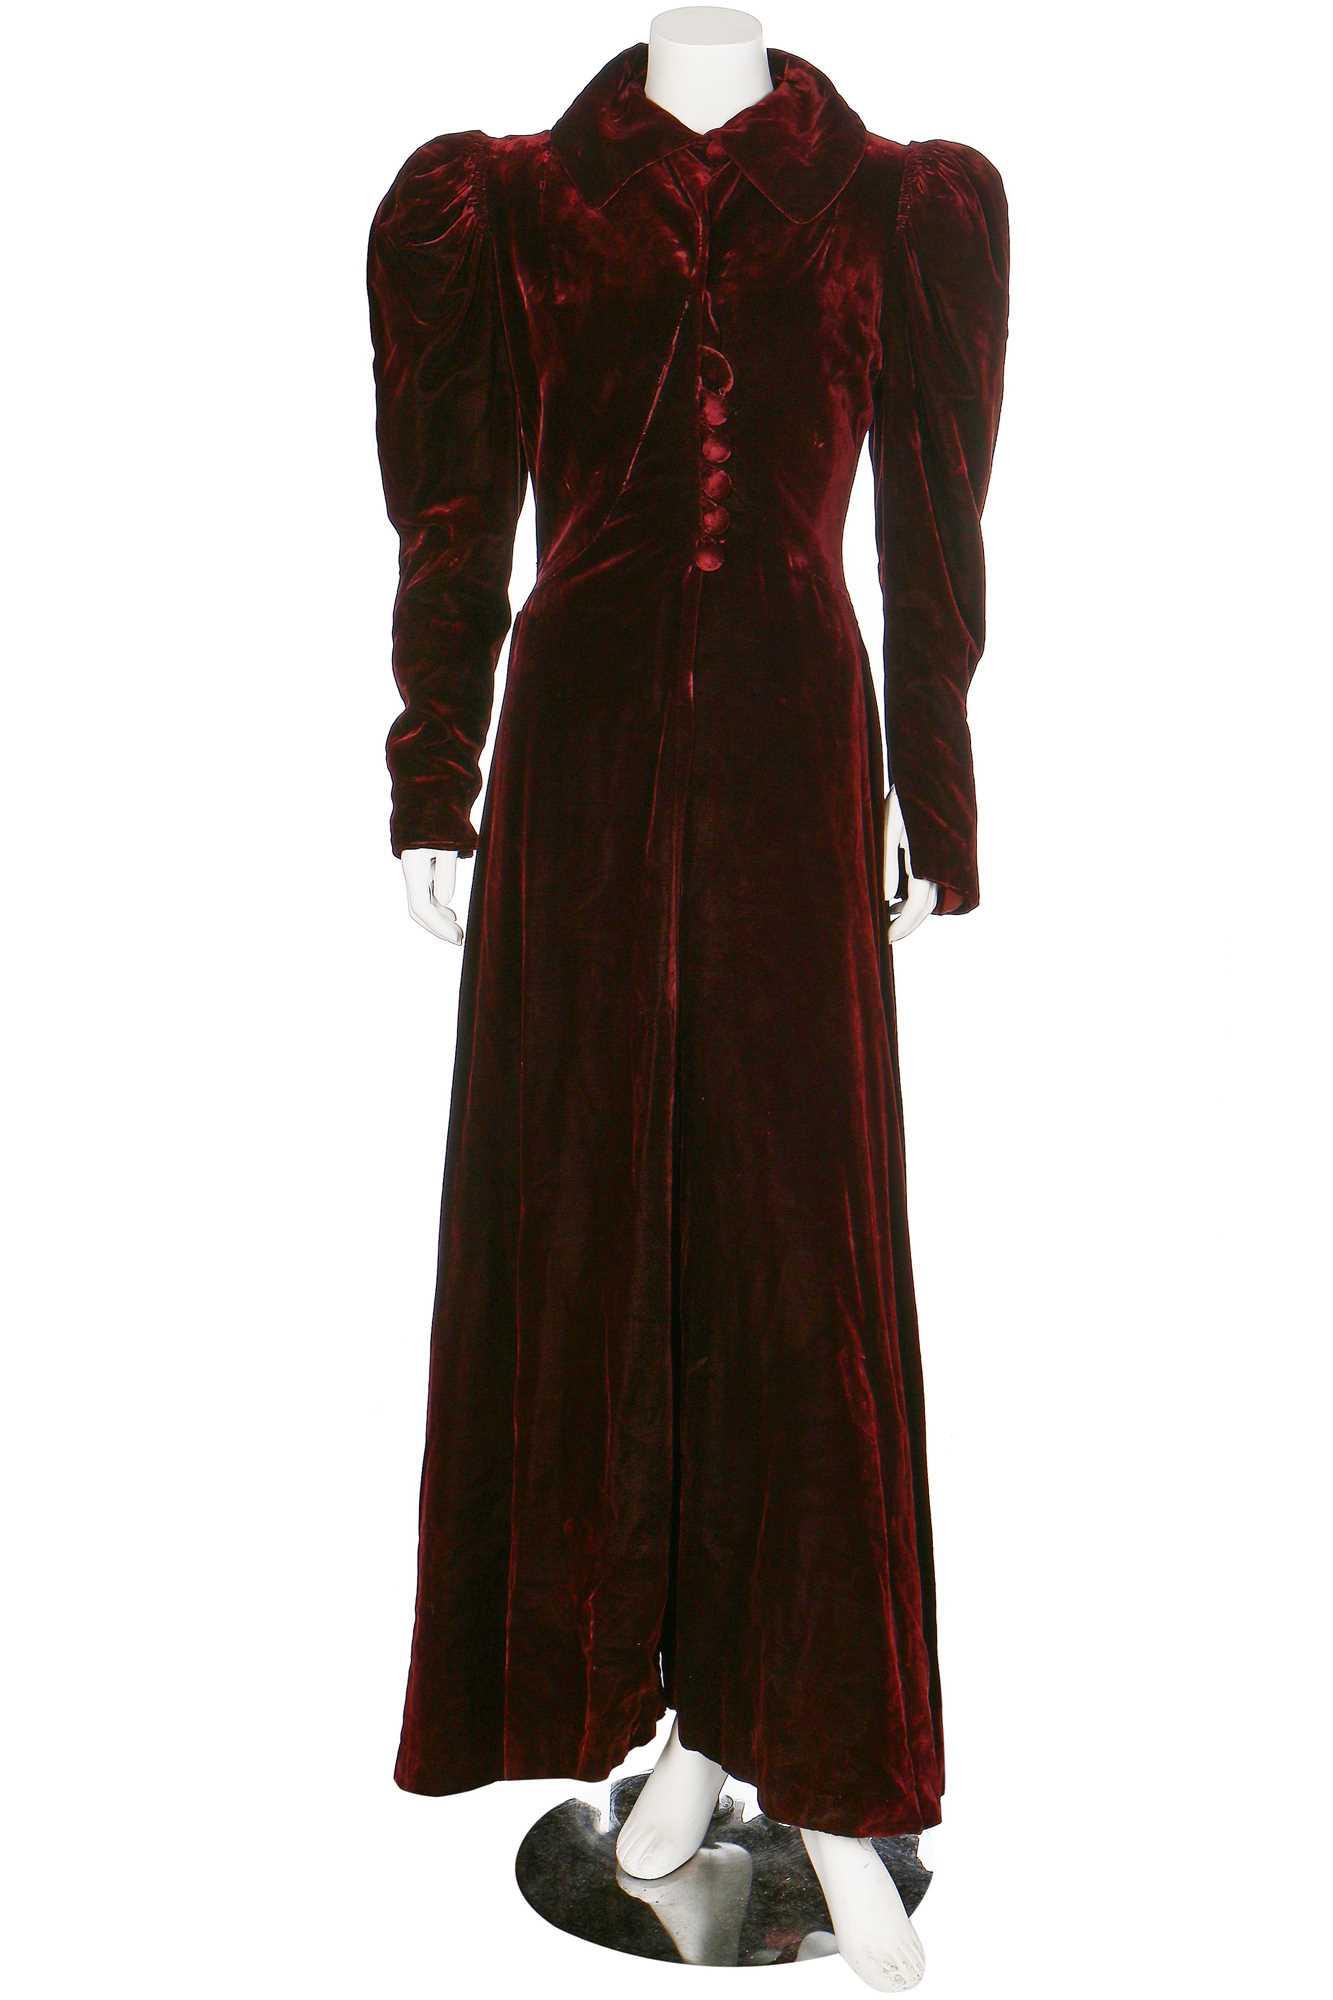 Lot 43-A bordeaux velvet evening coat with leg-o-mutton sleeves, 1930s